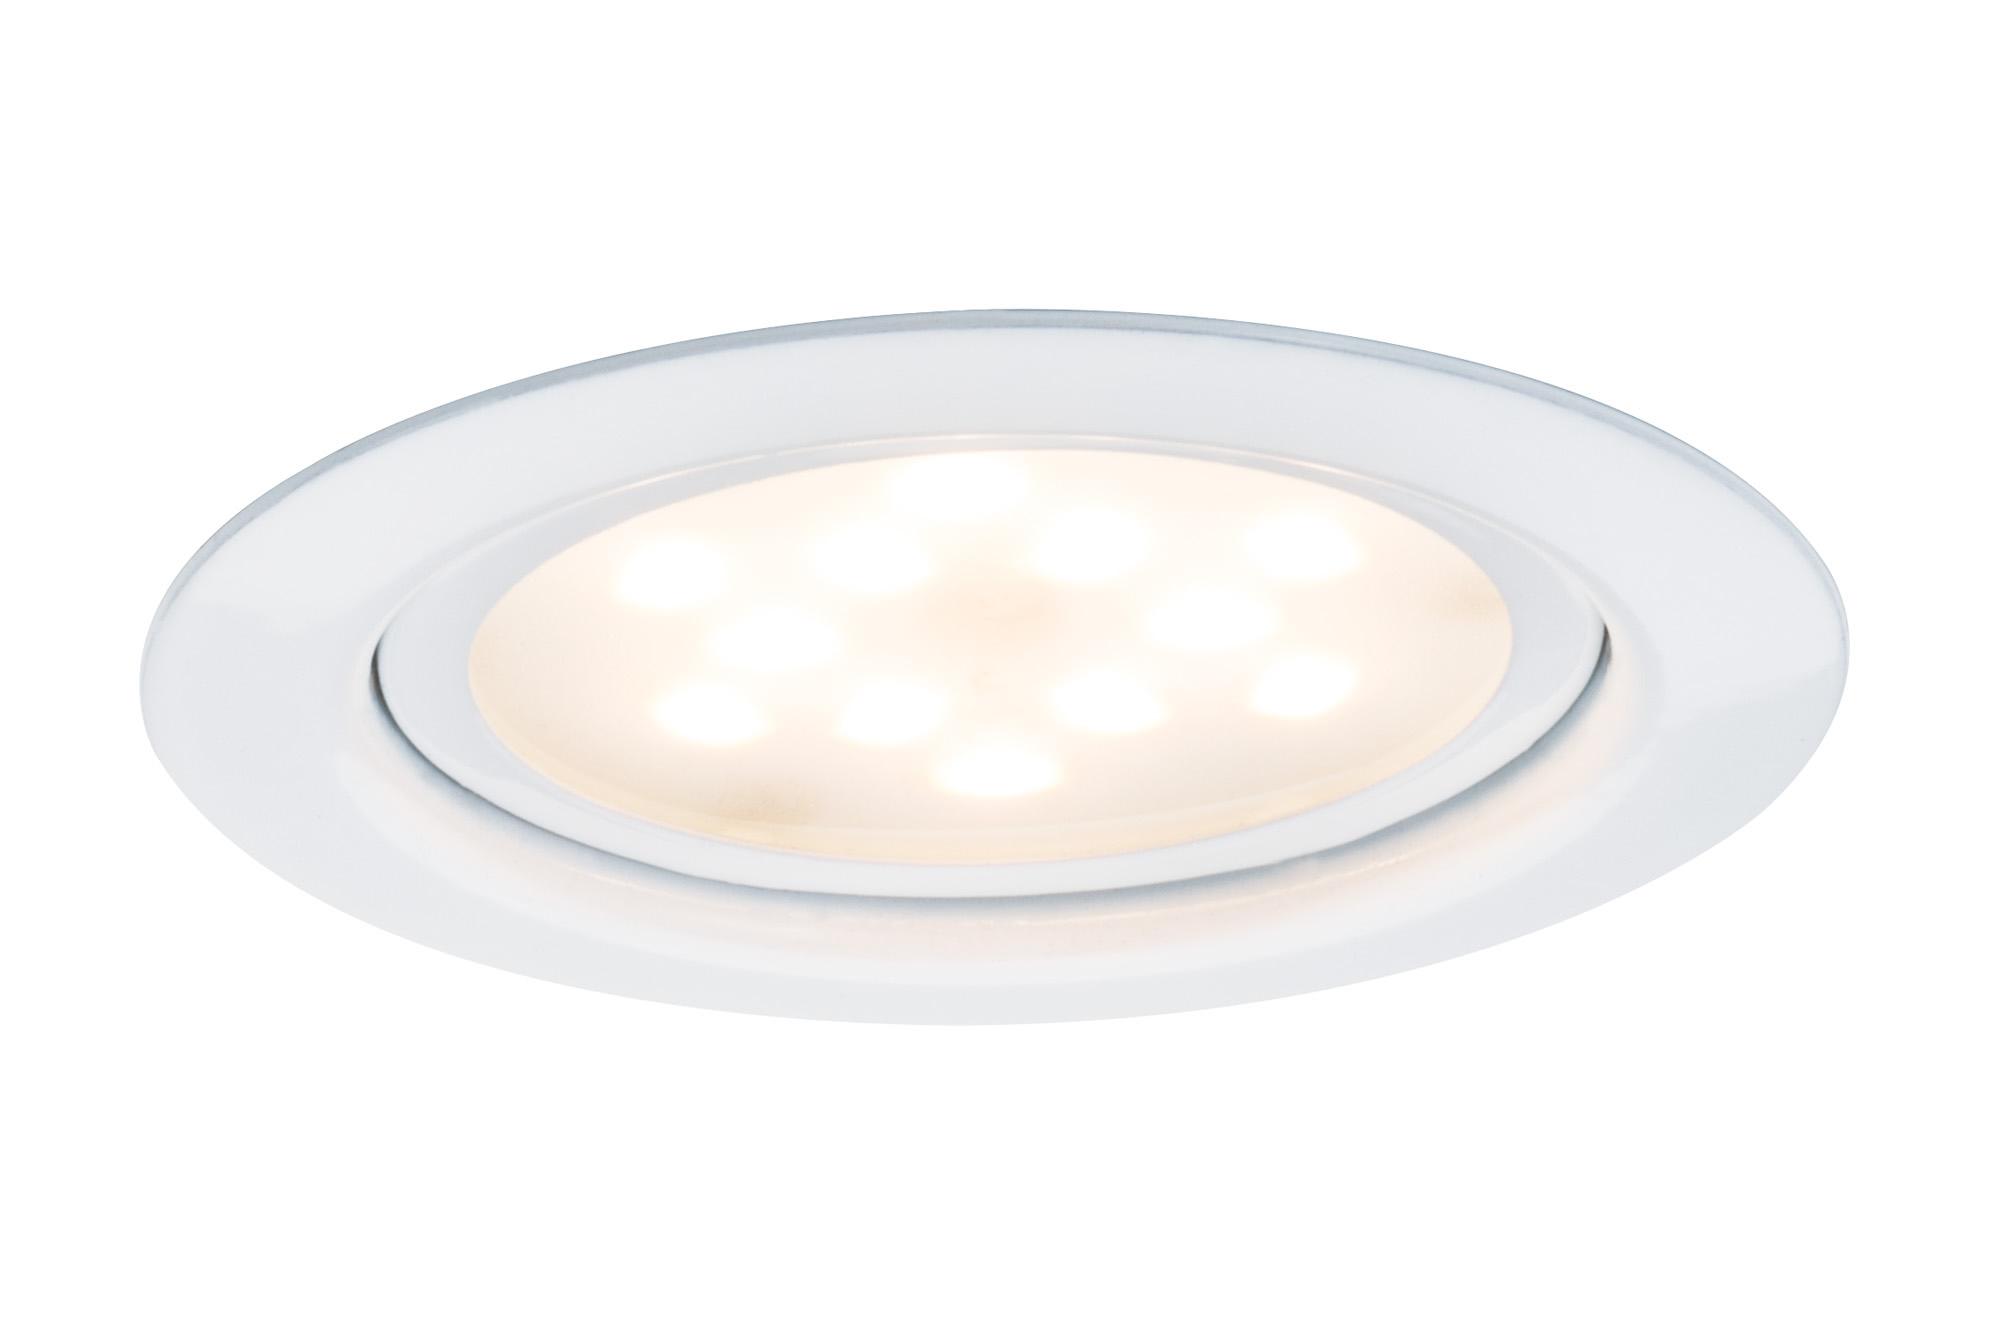 Paulmann. 93554 M?bel EBL LED 3x4W 65mm Ws